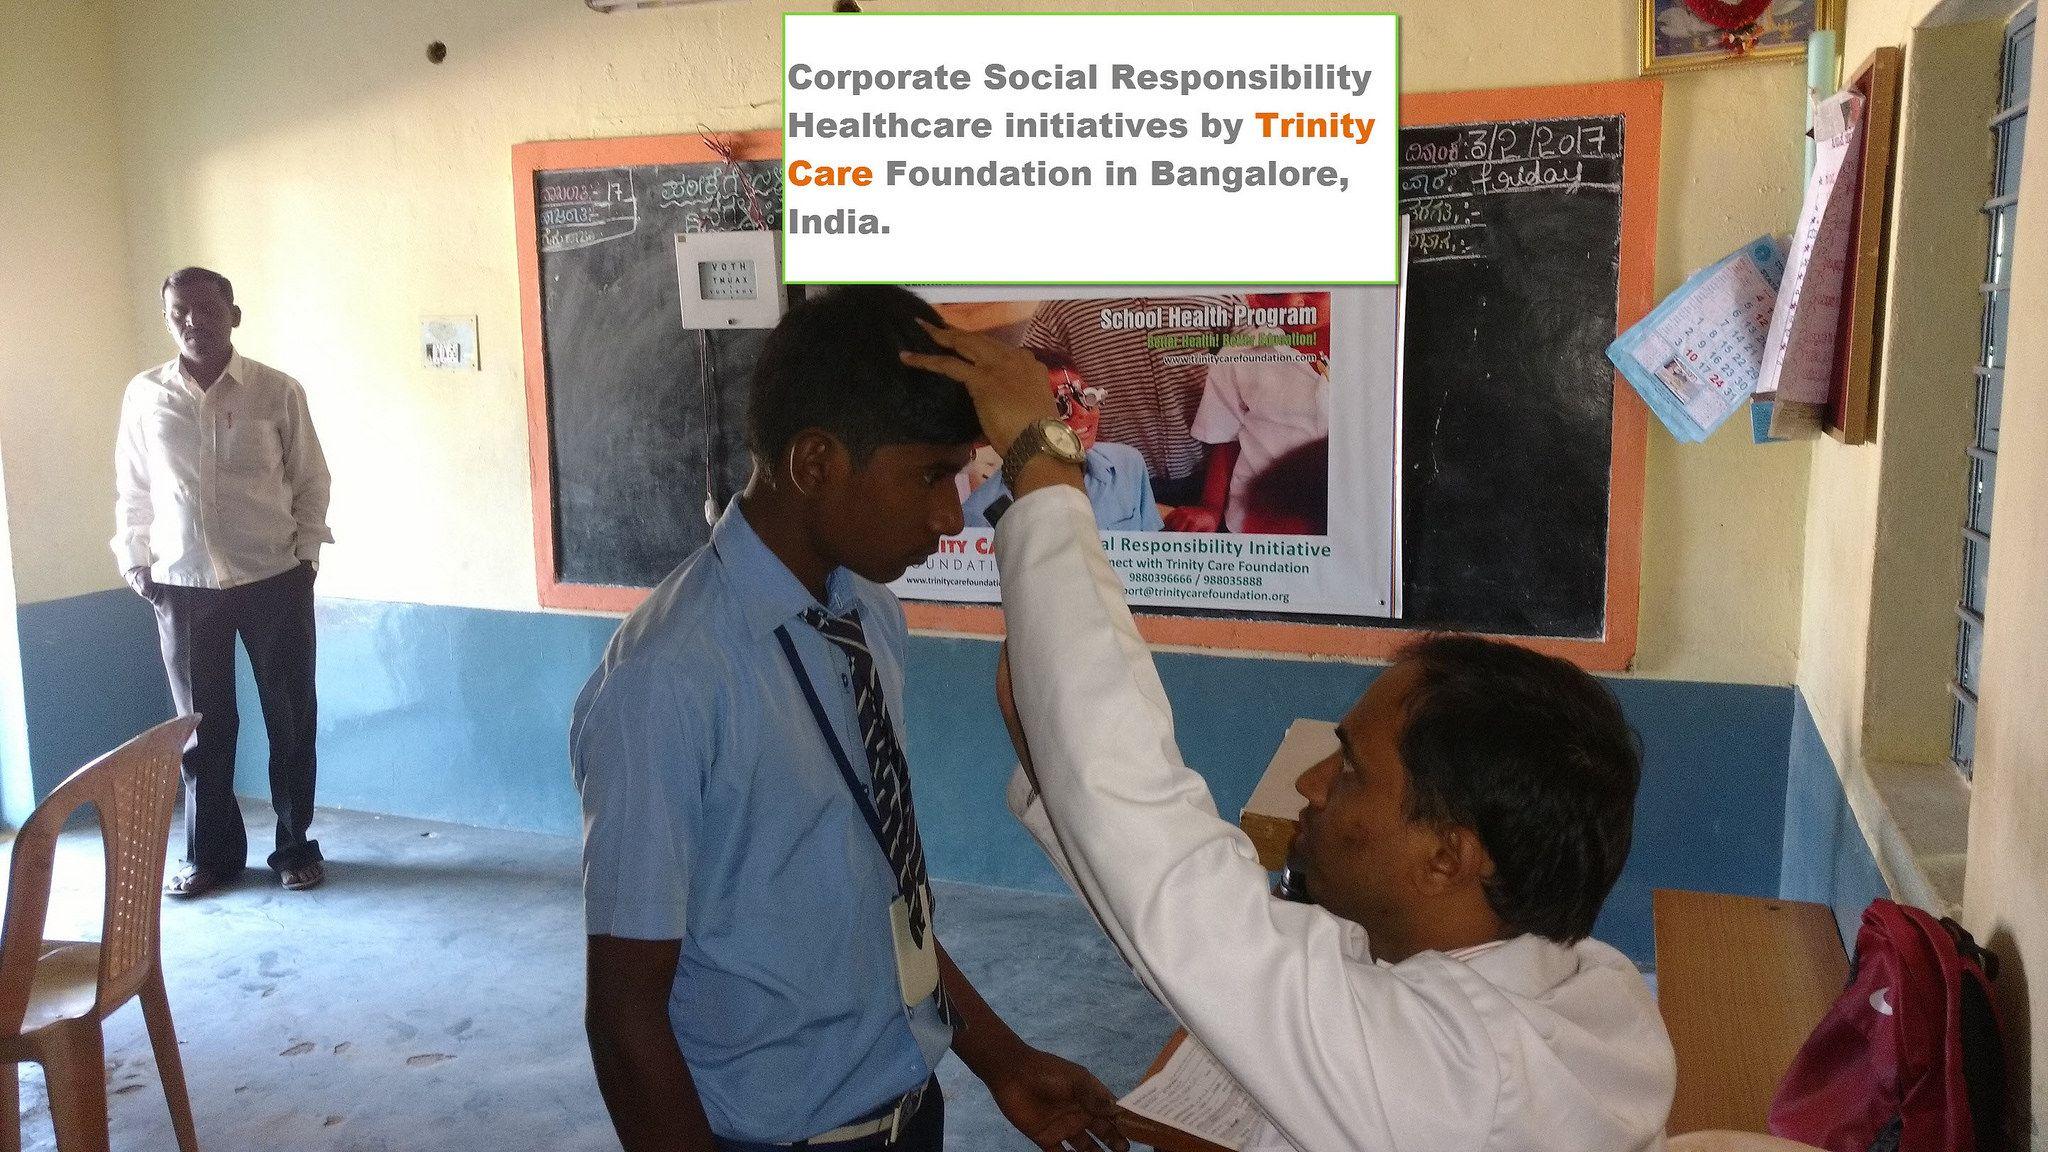 Corporate Social Responsibility activities Bangalore